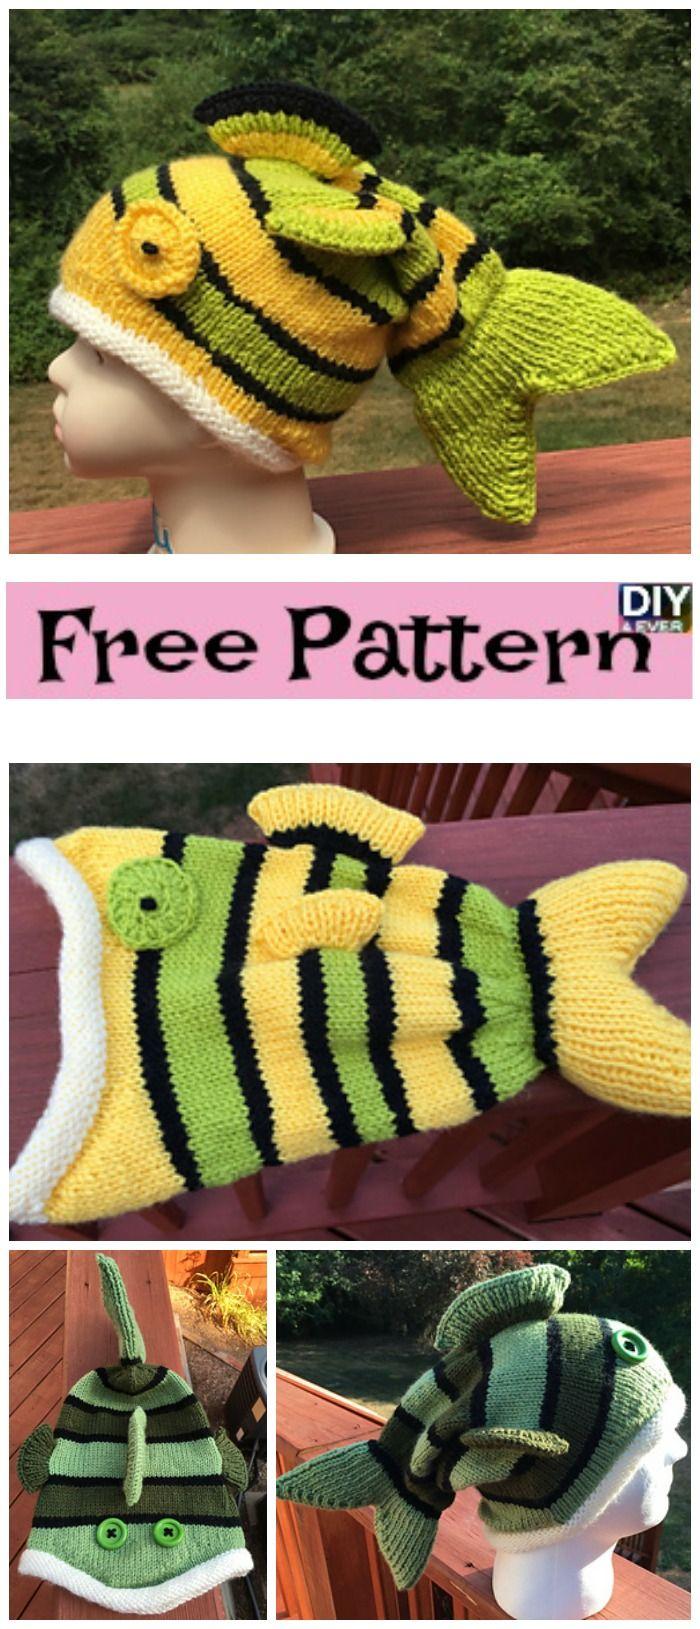 Cute Knitted Fish Hat - Free Pattern | Free pattern, Fish and Patterns